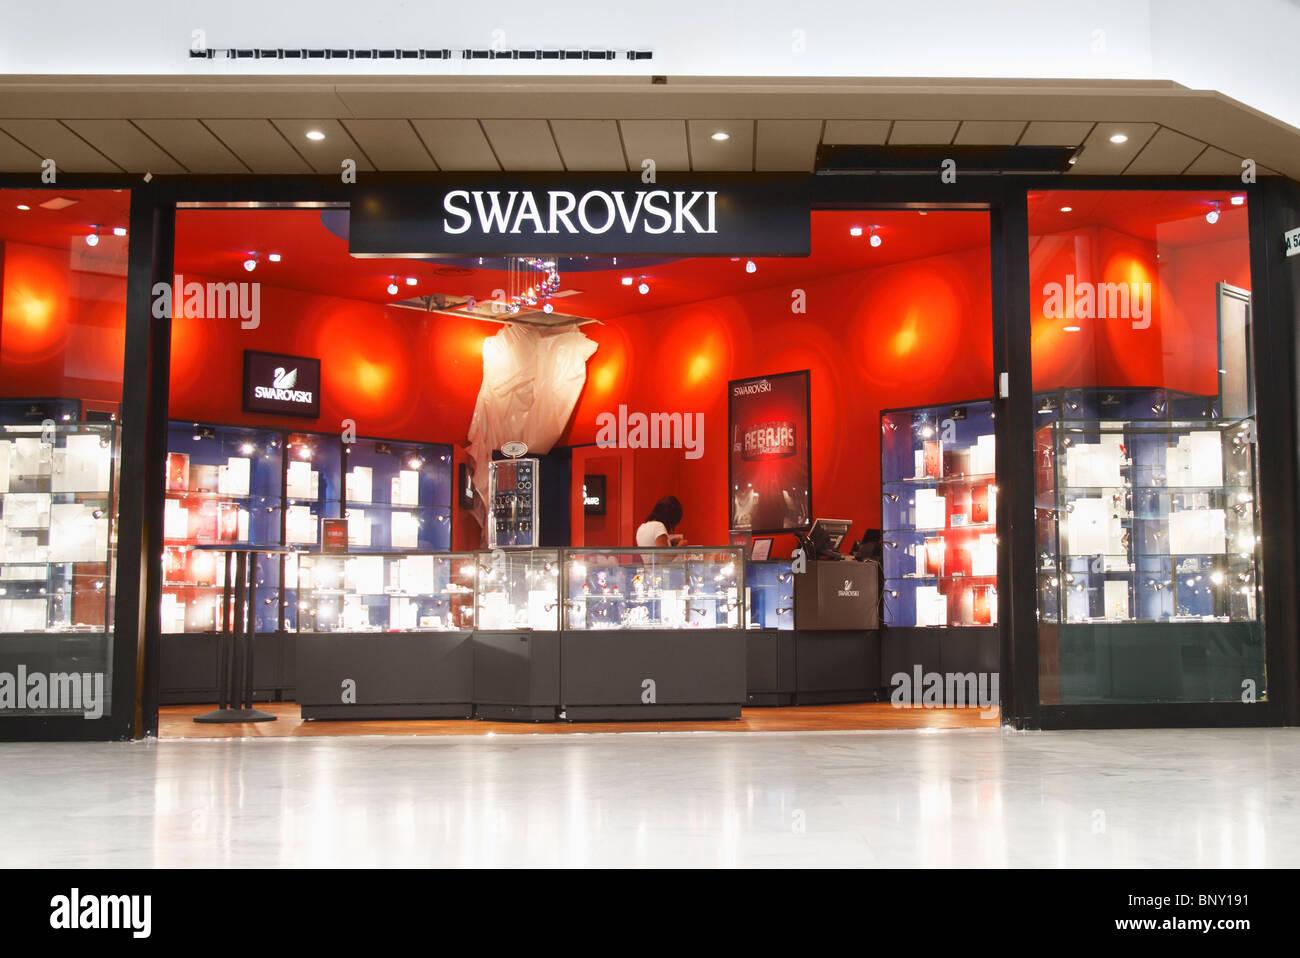 d9daf7595d33 Swarovski Shop Stock Photos   Swarovski Shop Stock Images - Page 2 ...